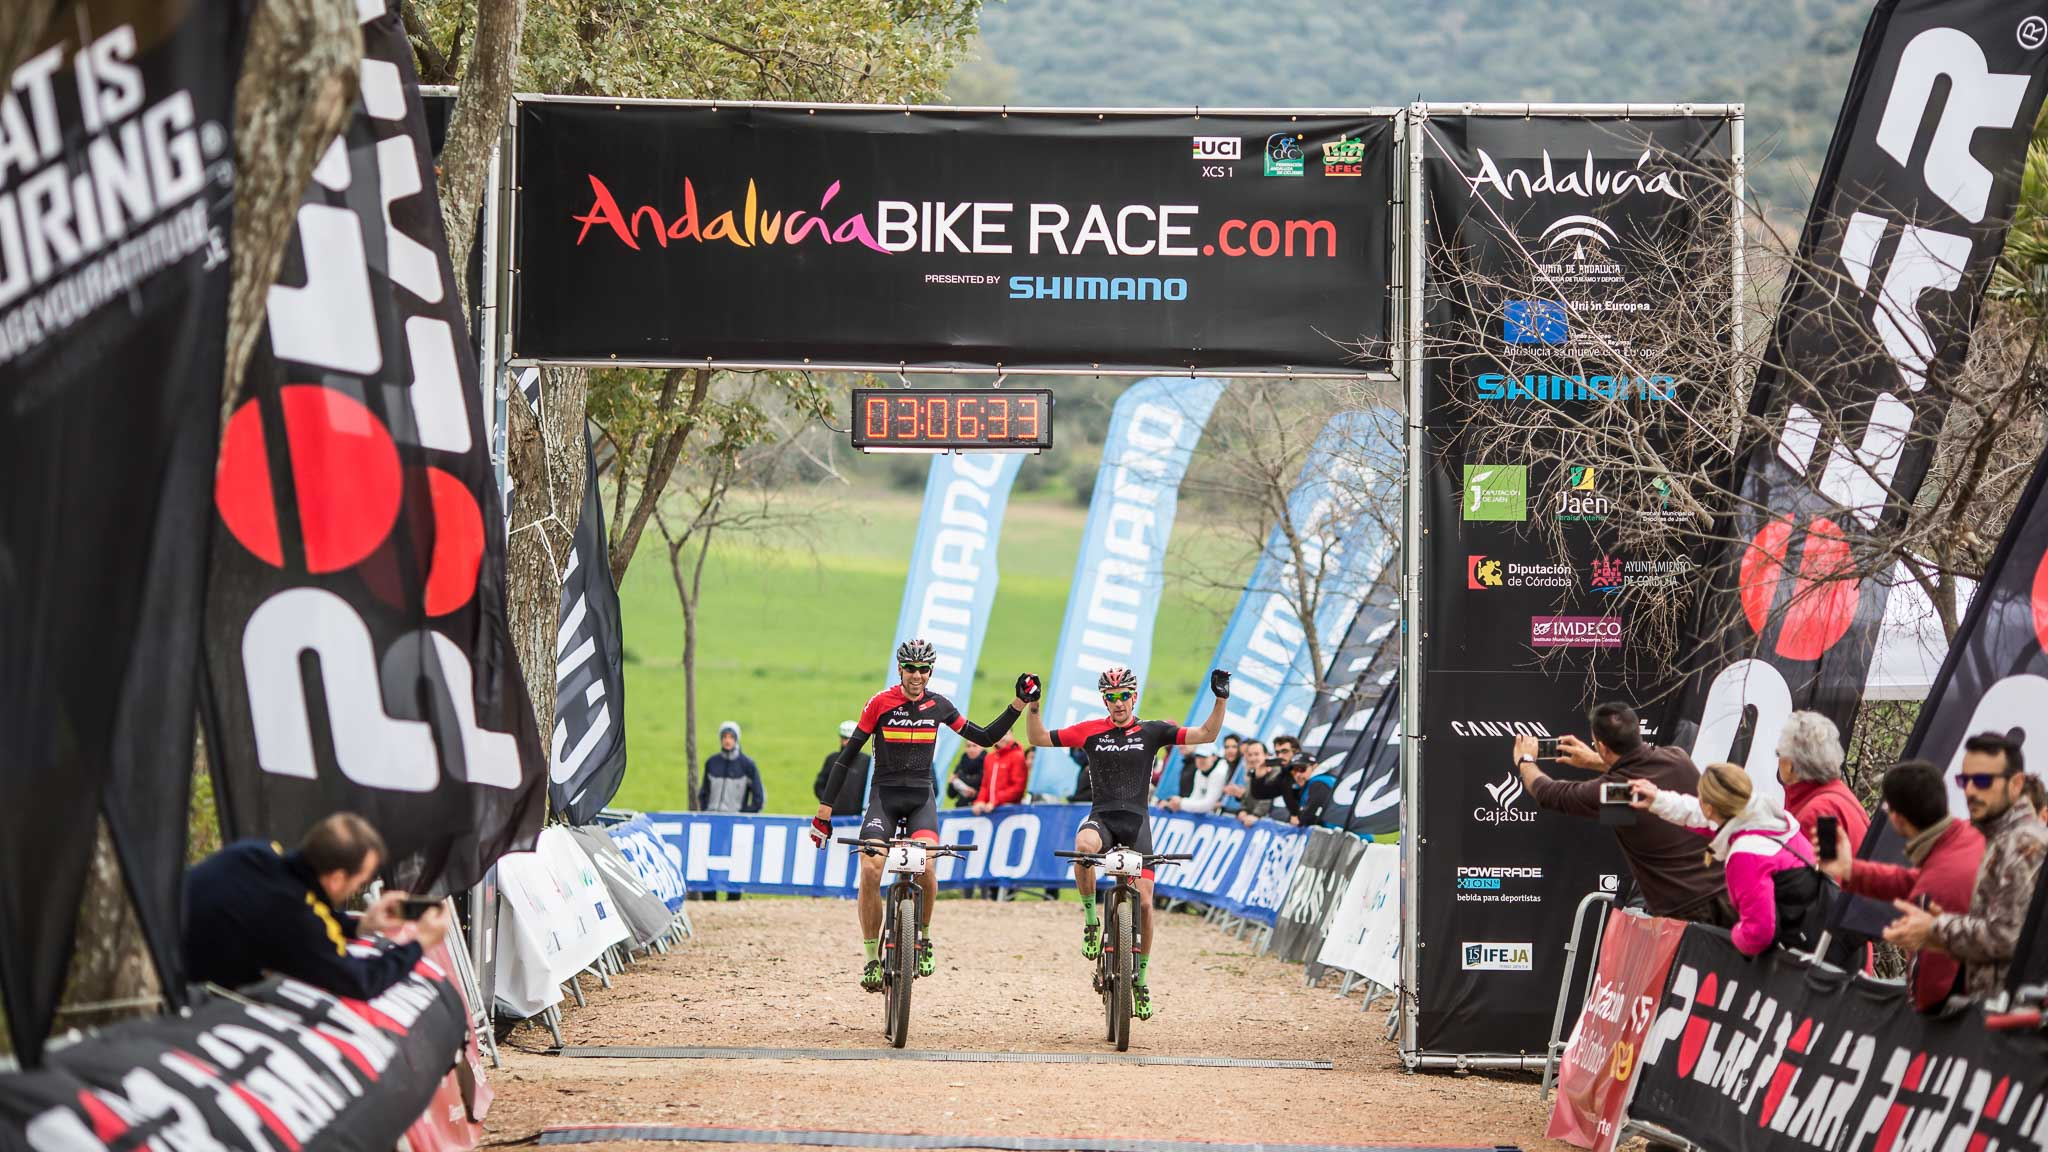 20160226-Andalucia-Bike-Race-2016-B29B2283